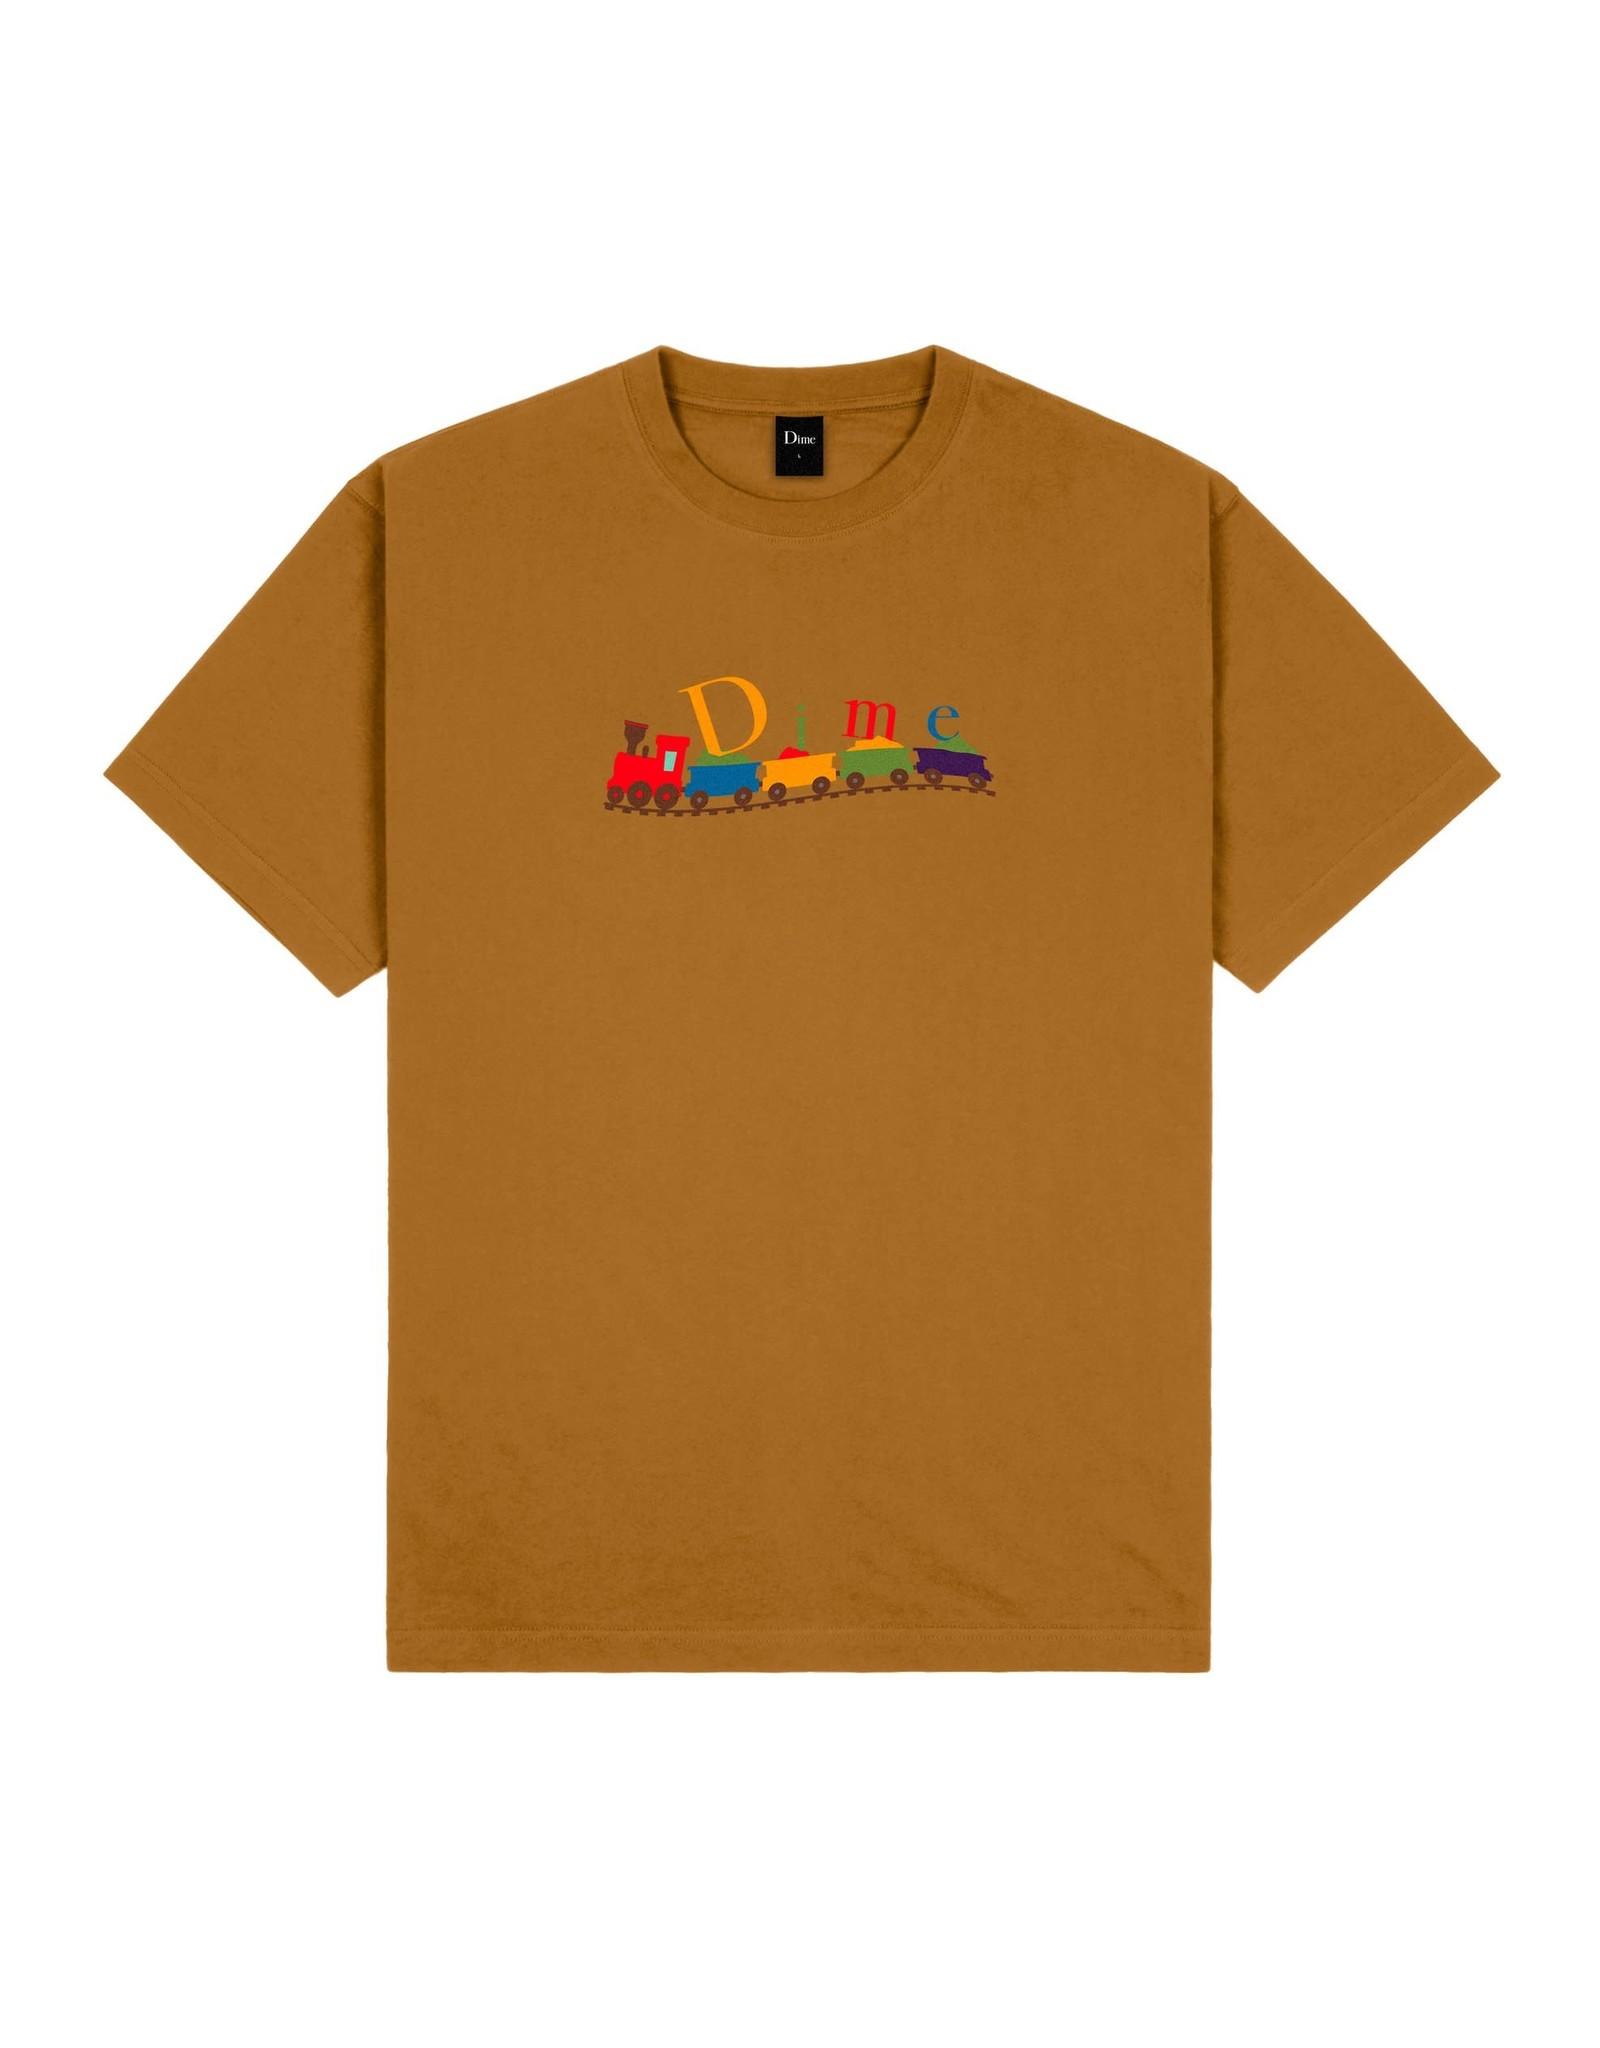 Dime Classic Train T-Shirt - Coffee